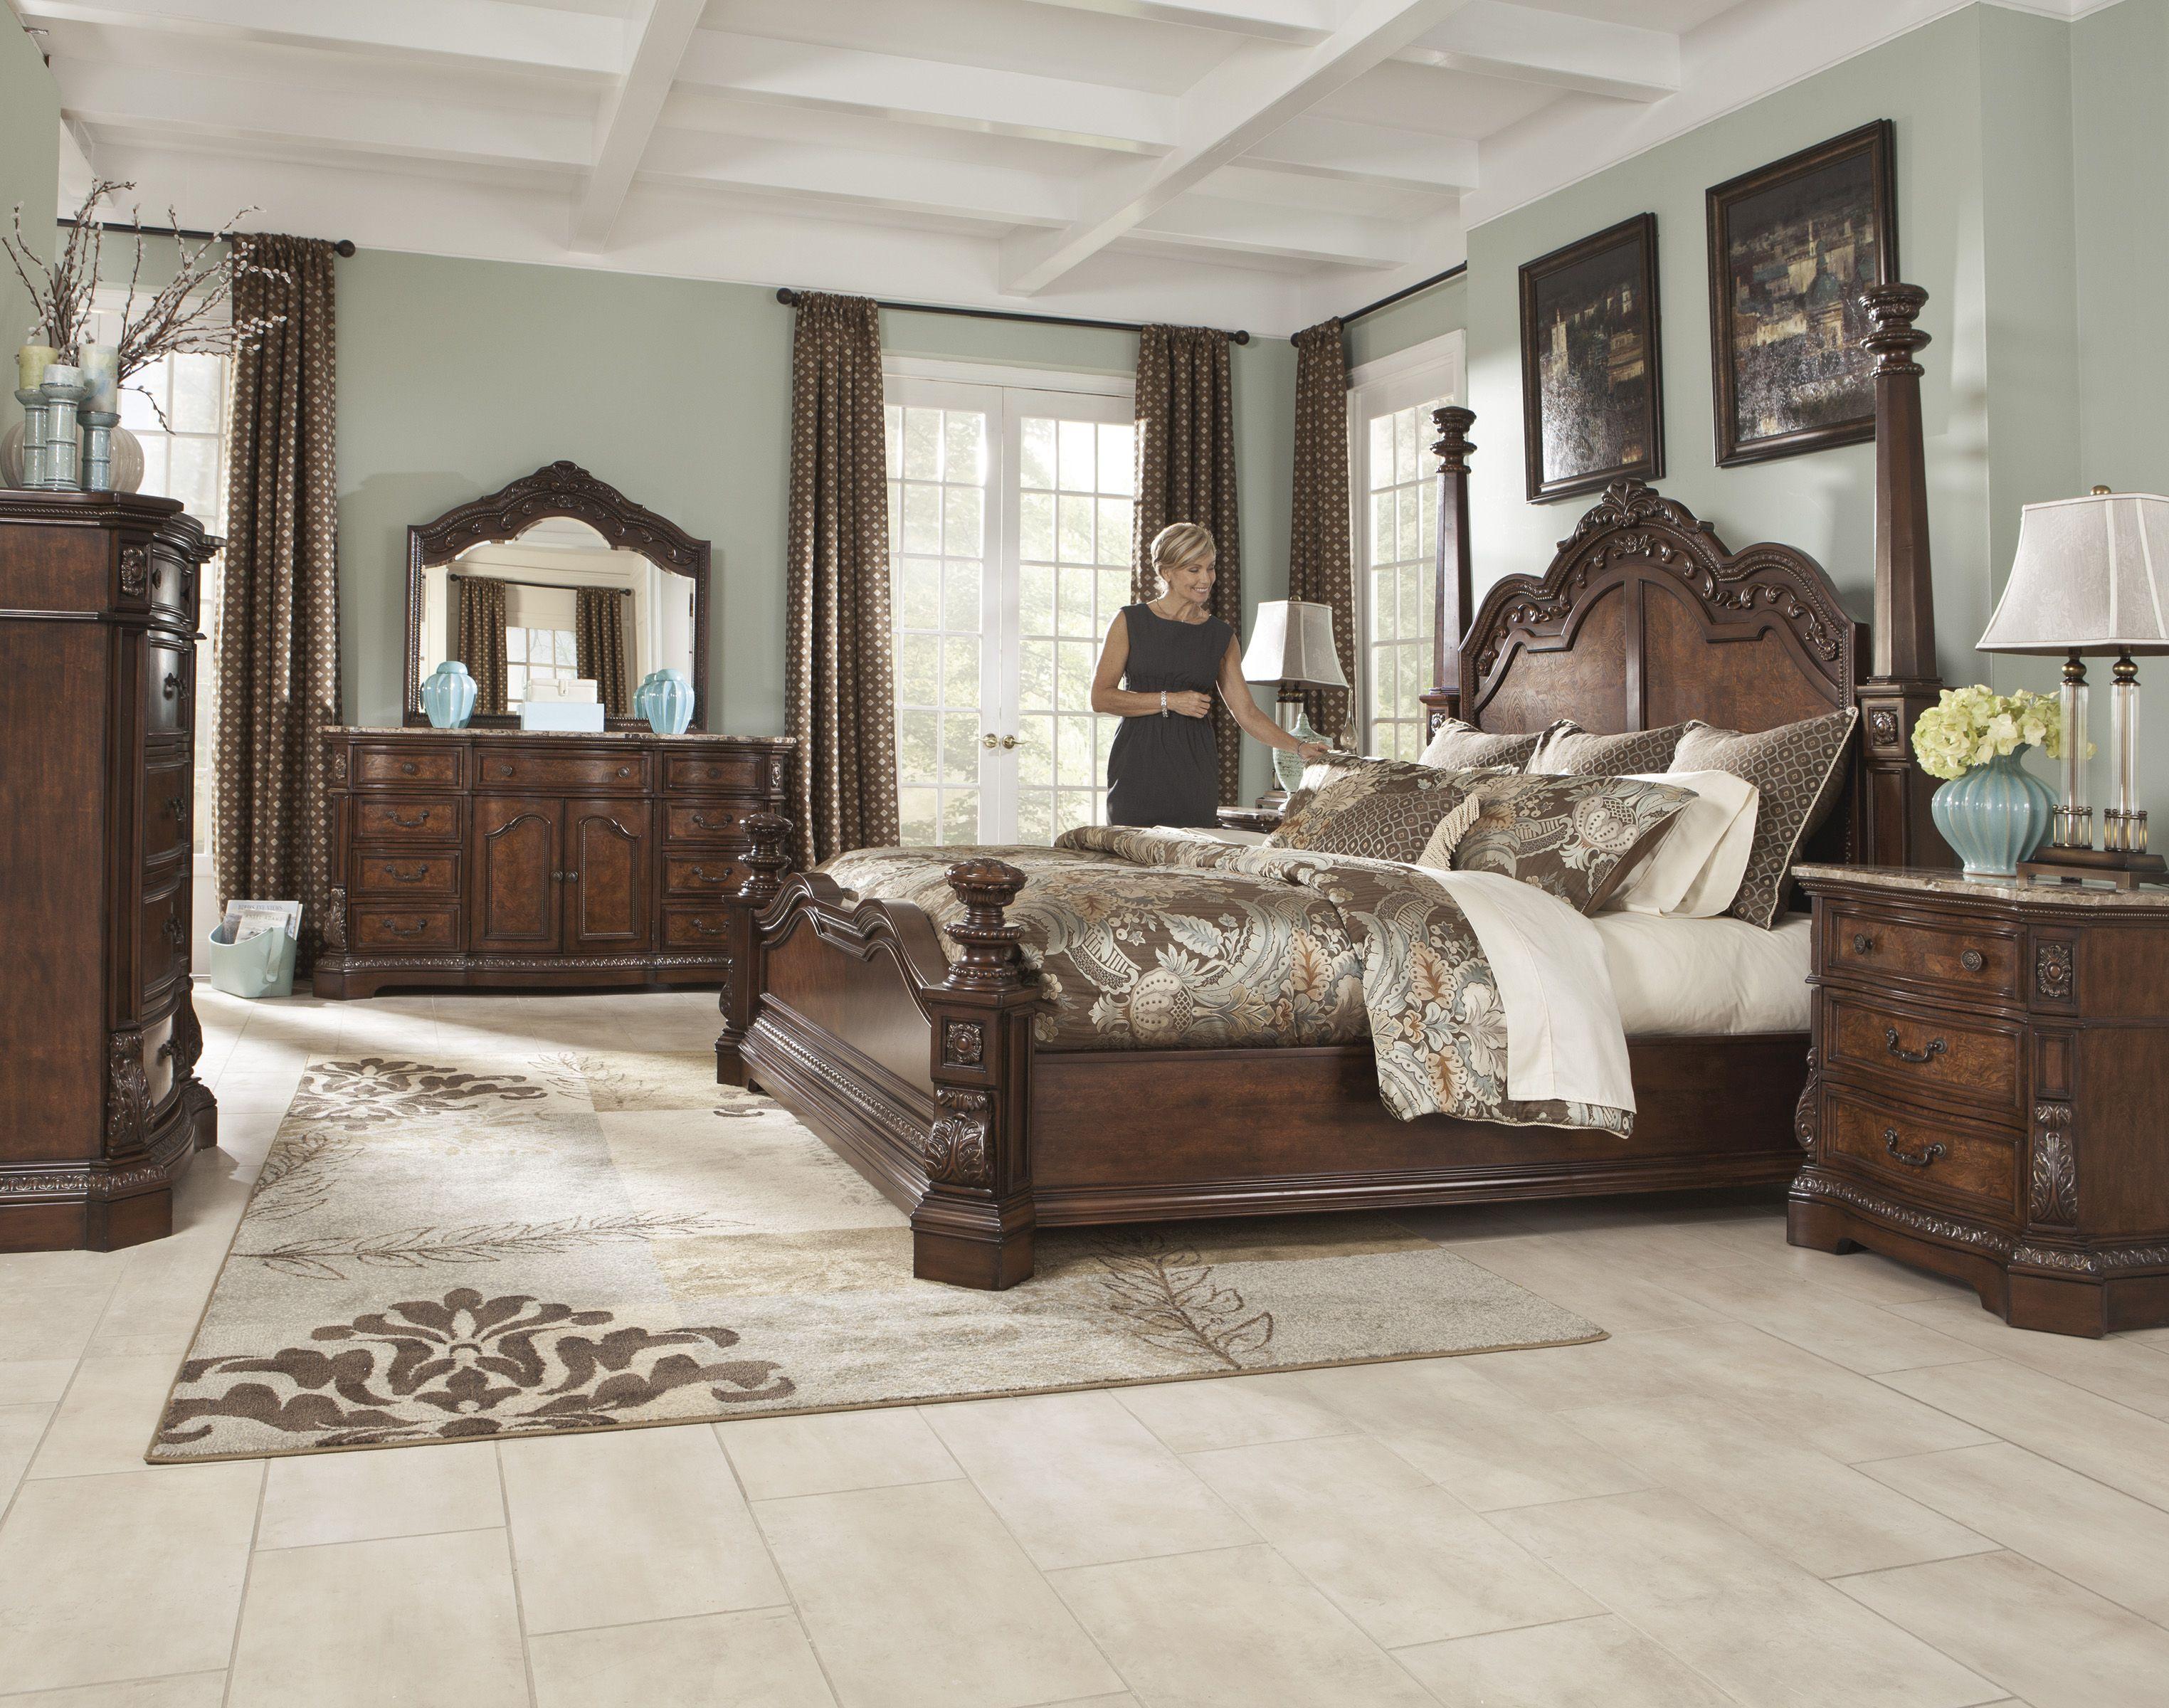 Adele Poster Bedroom Set By Ashley At Crowley Furniture In Kansas City King Bedroom Sets Bedroom Sets Master Bedroom Interior